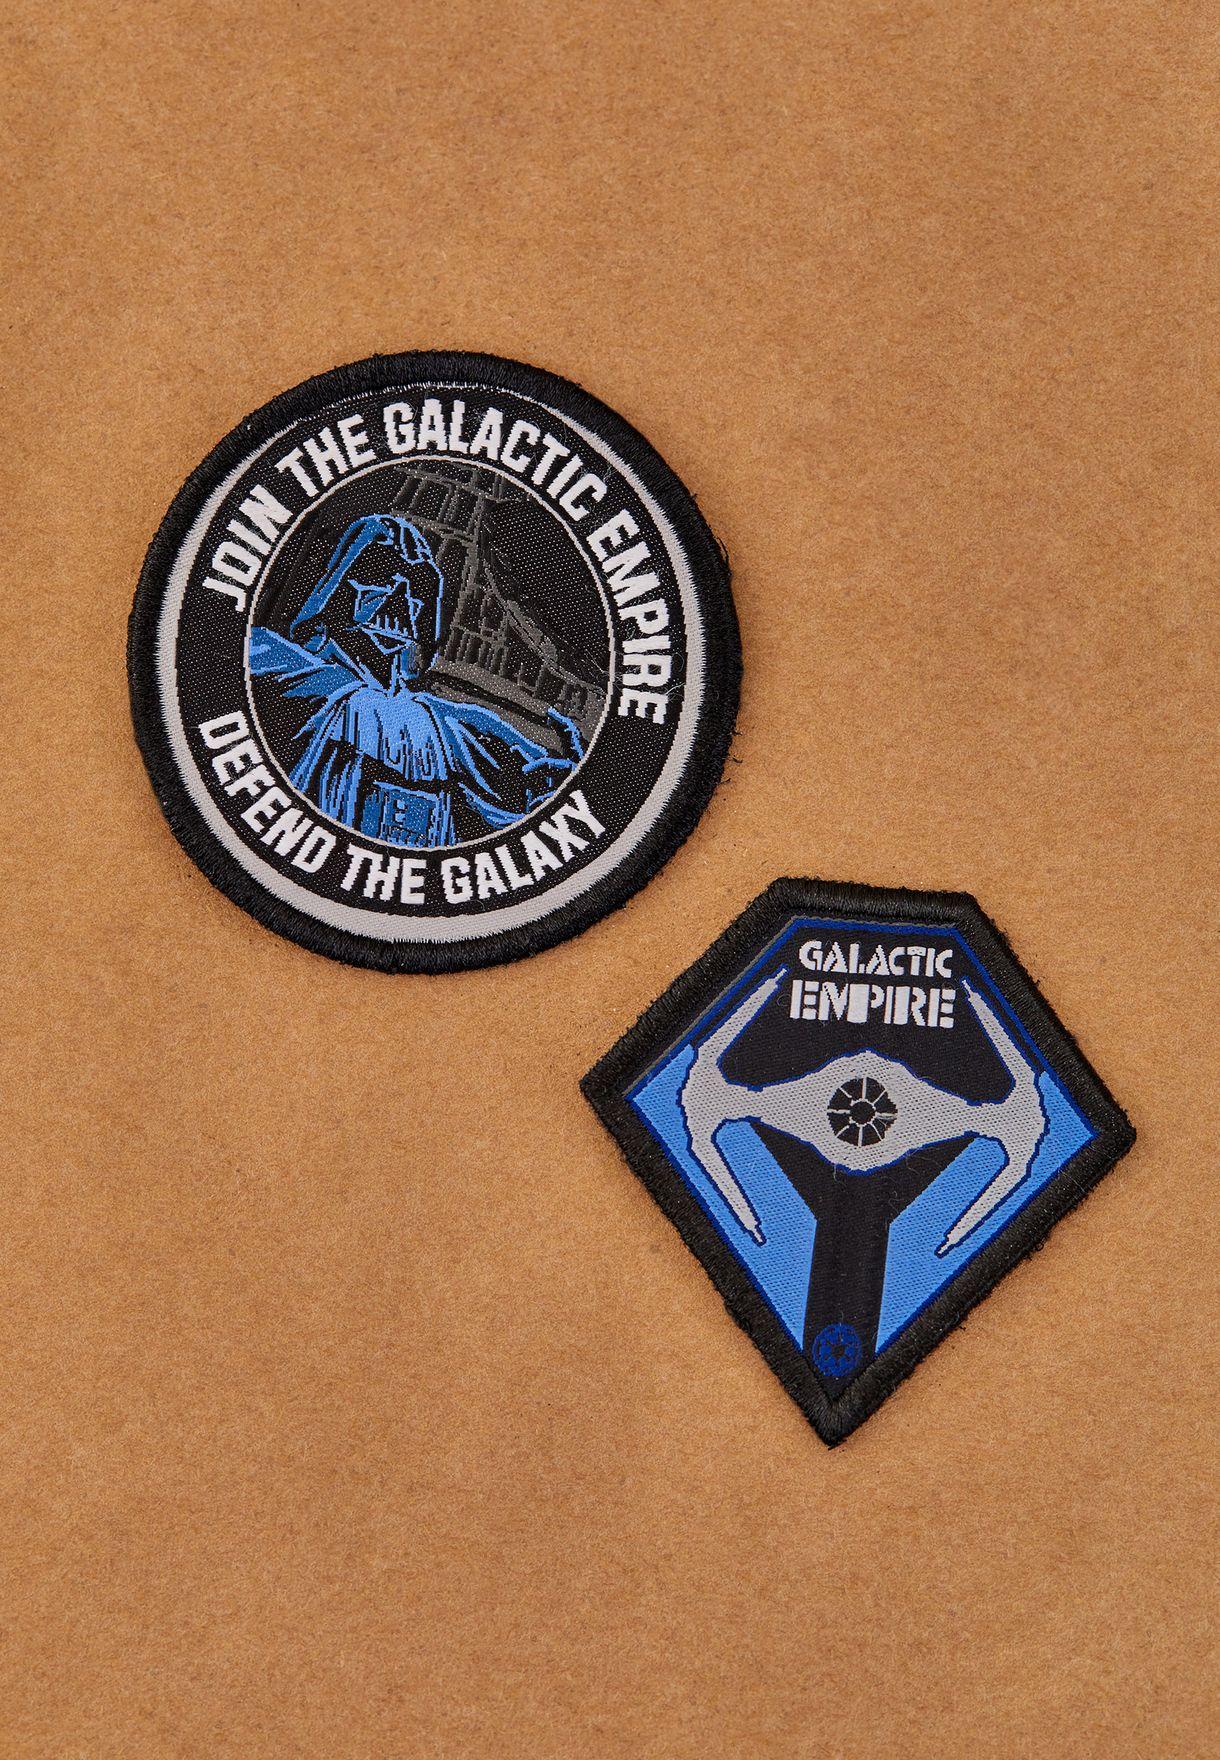 Medium Star wars Galactic Emire Duo Badge Pack